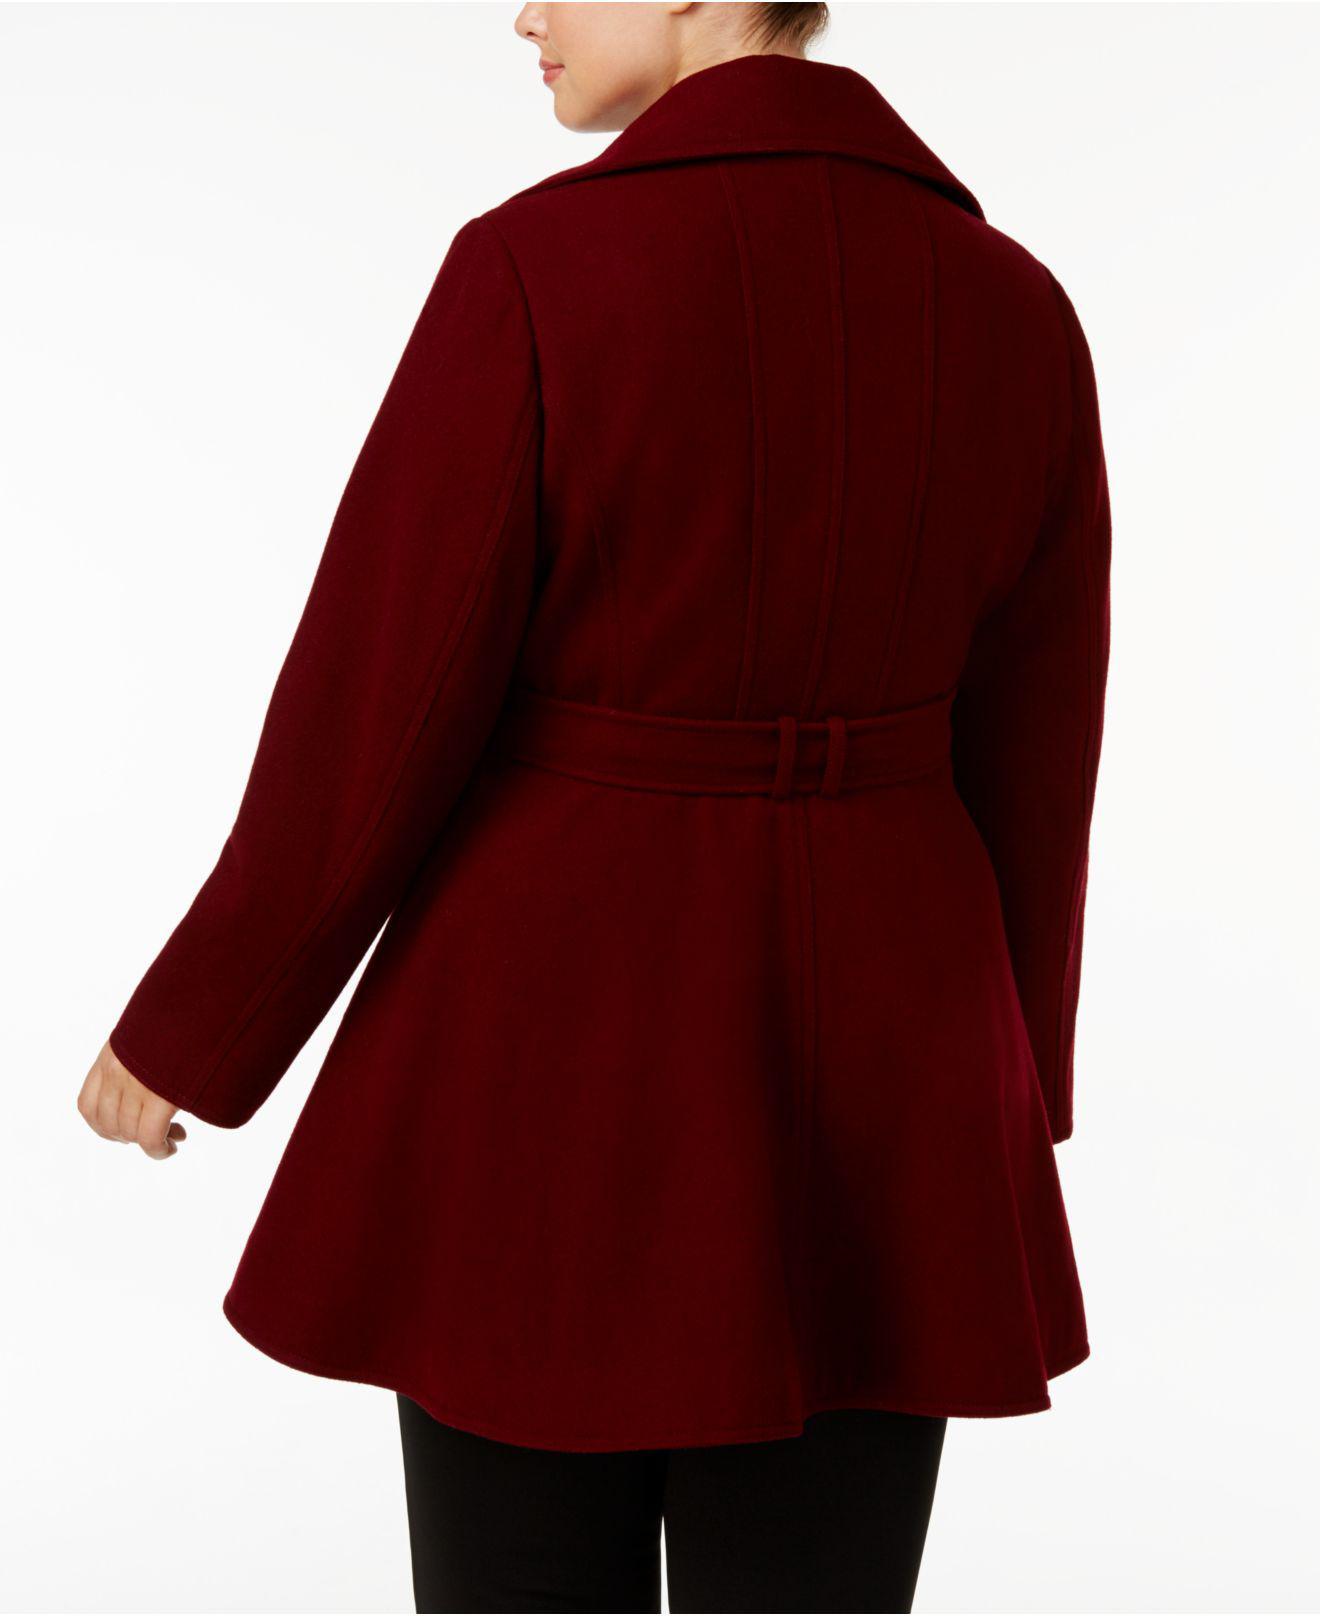 50bcab91cb3e7 Lyst - Inc International Concepts I.n.c. Plus Size Skirted Walker Coat